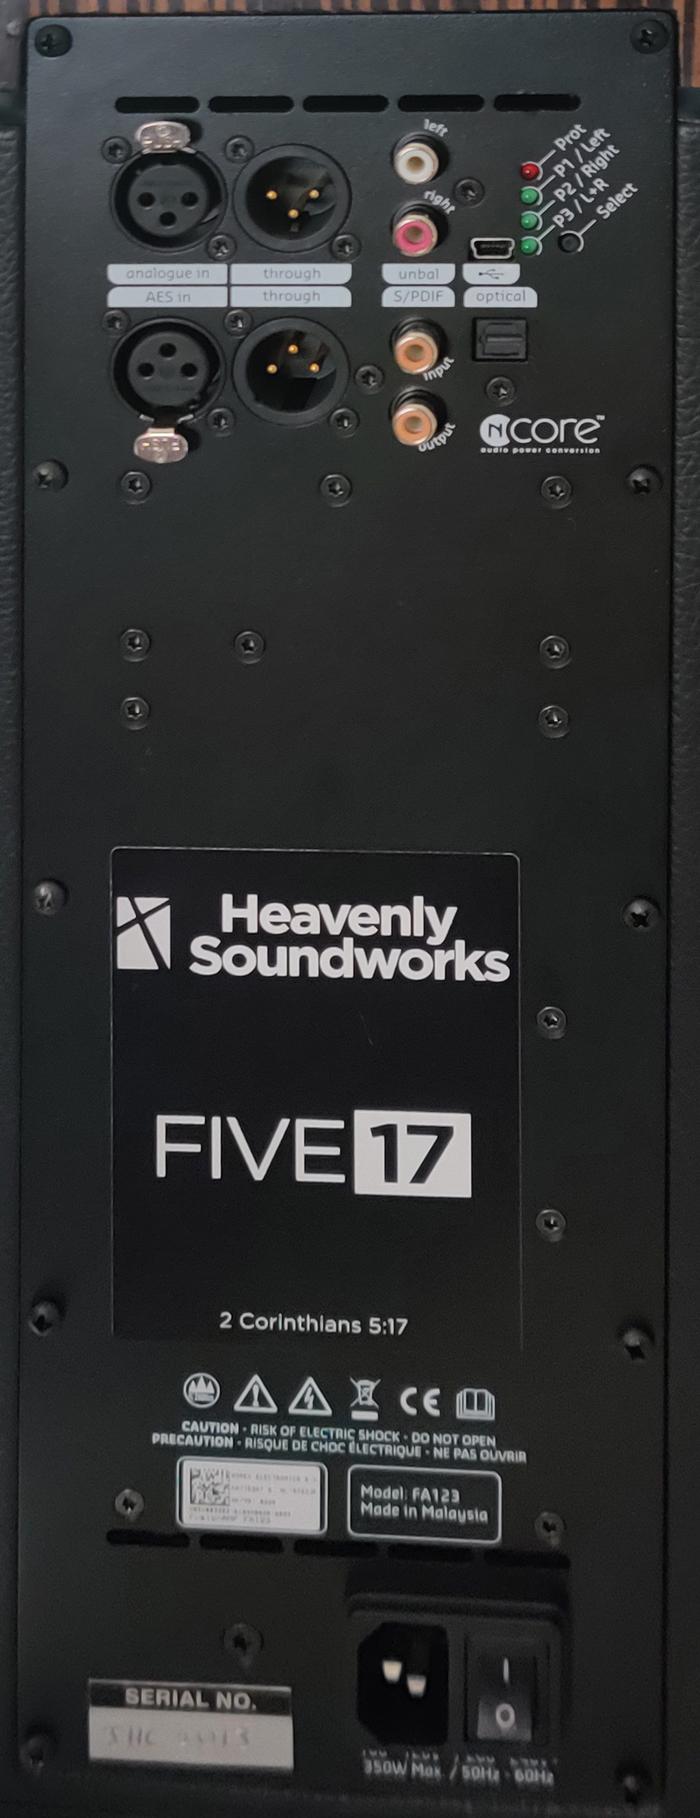 Heavenly Soundworks